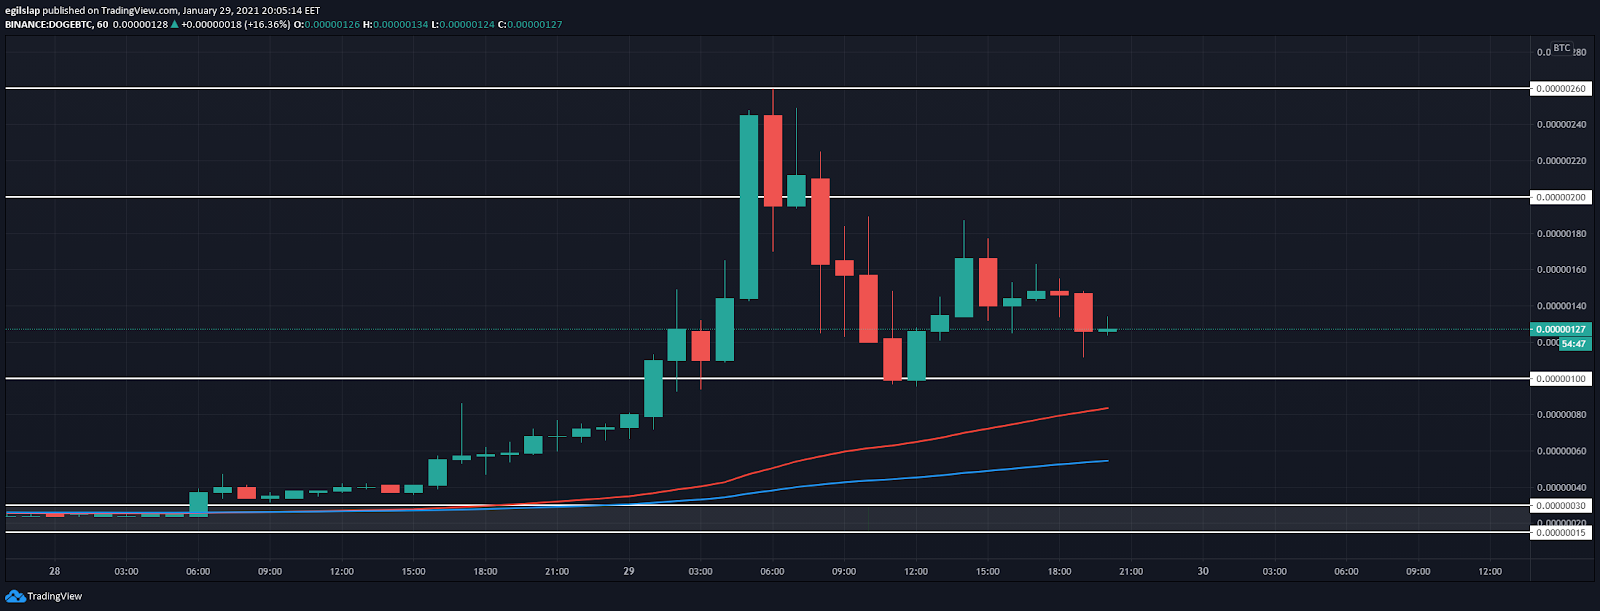 Dogecoin price prediction 2021: DOGE skyrockets to 200 Satoshi in a historical bullish move 4